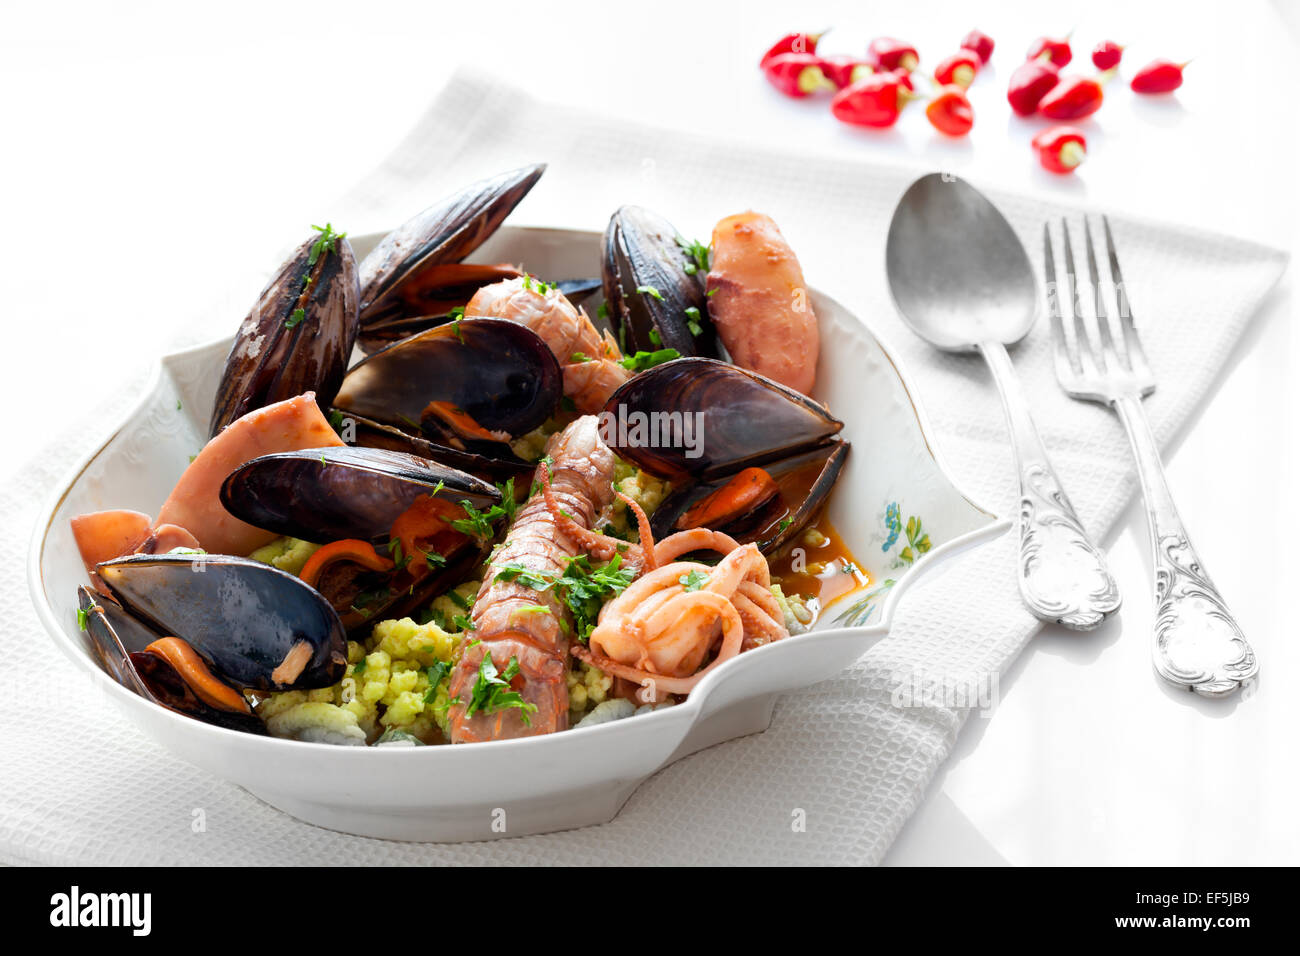 Sea Flavored Passatelli - Stock Image